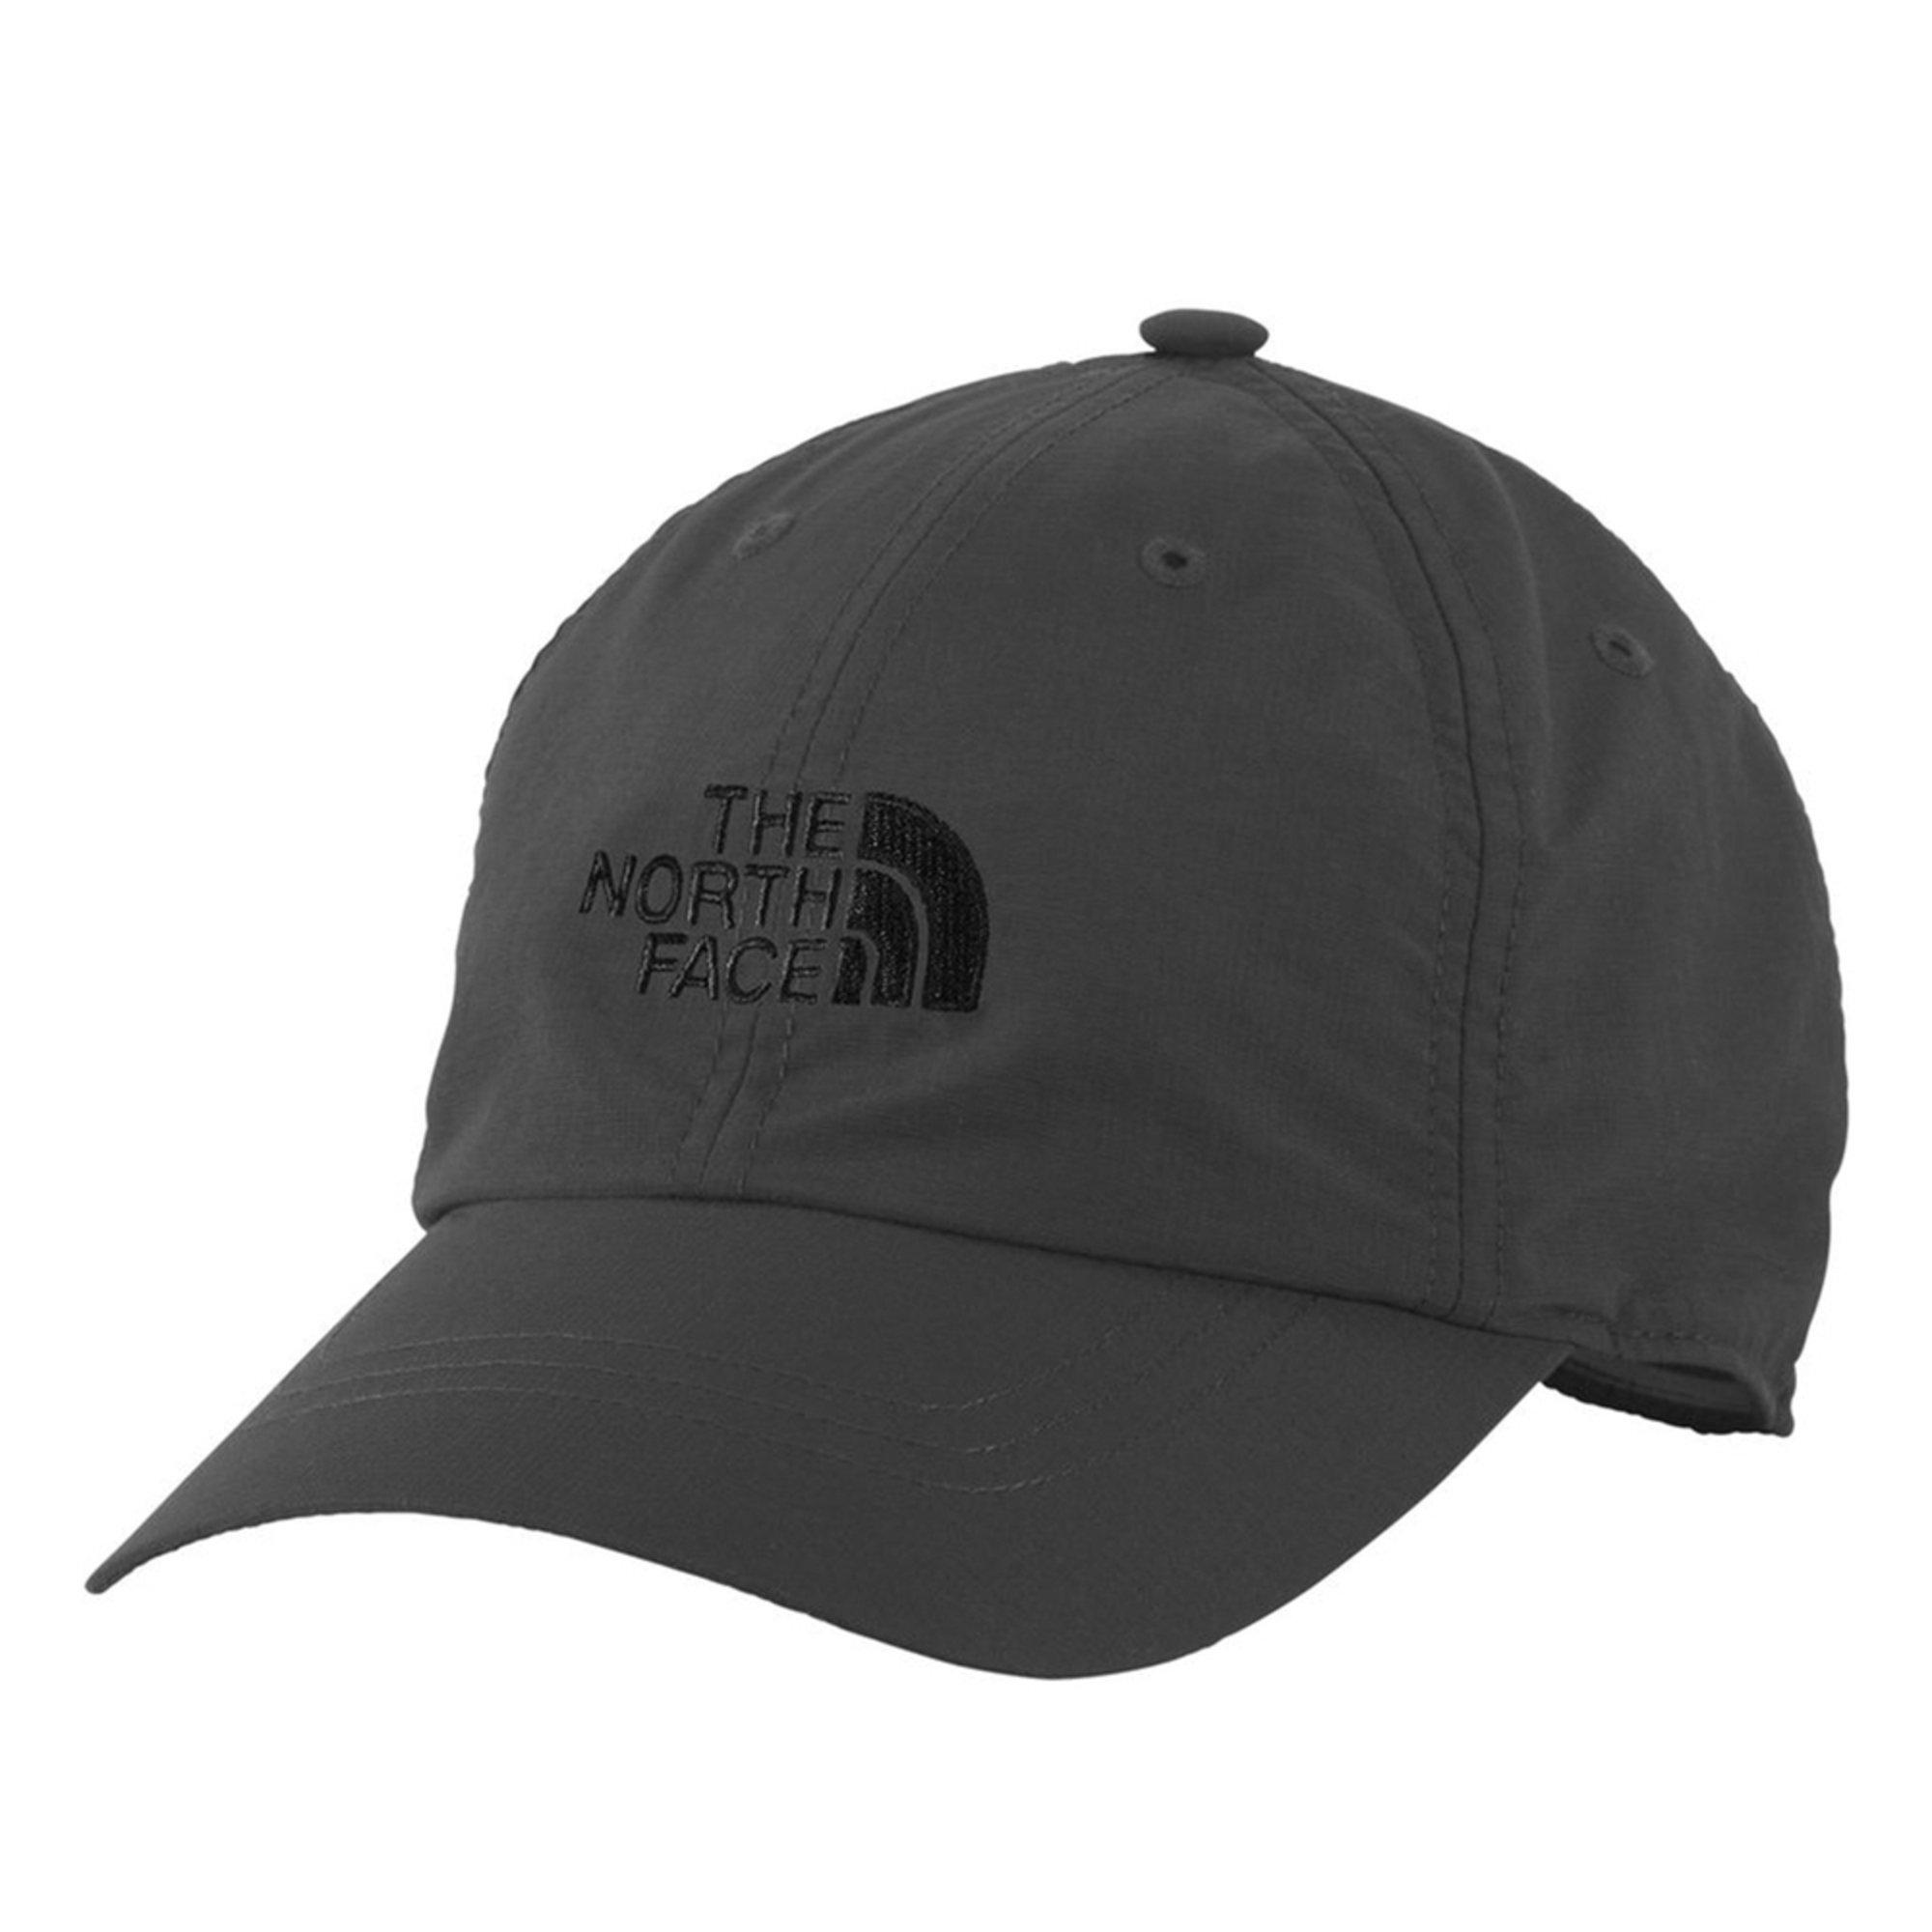 398c06c84 The North Face Men's Horizon Hat - Asphalt Grey